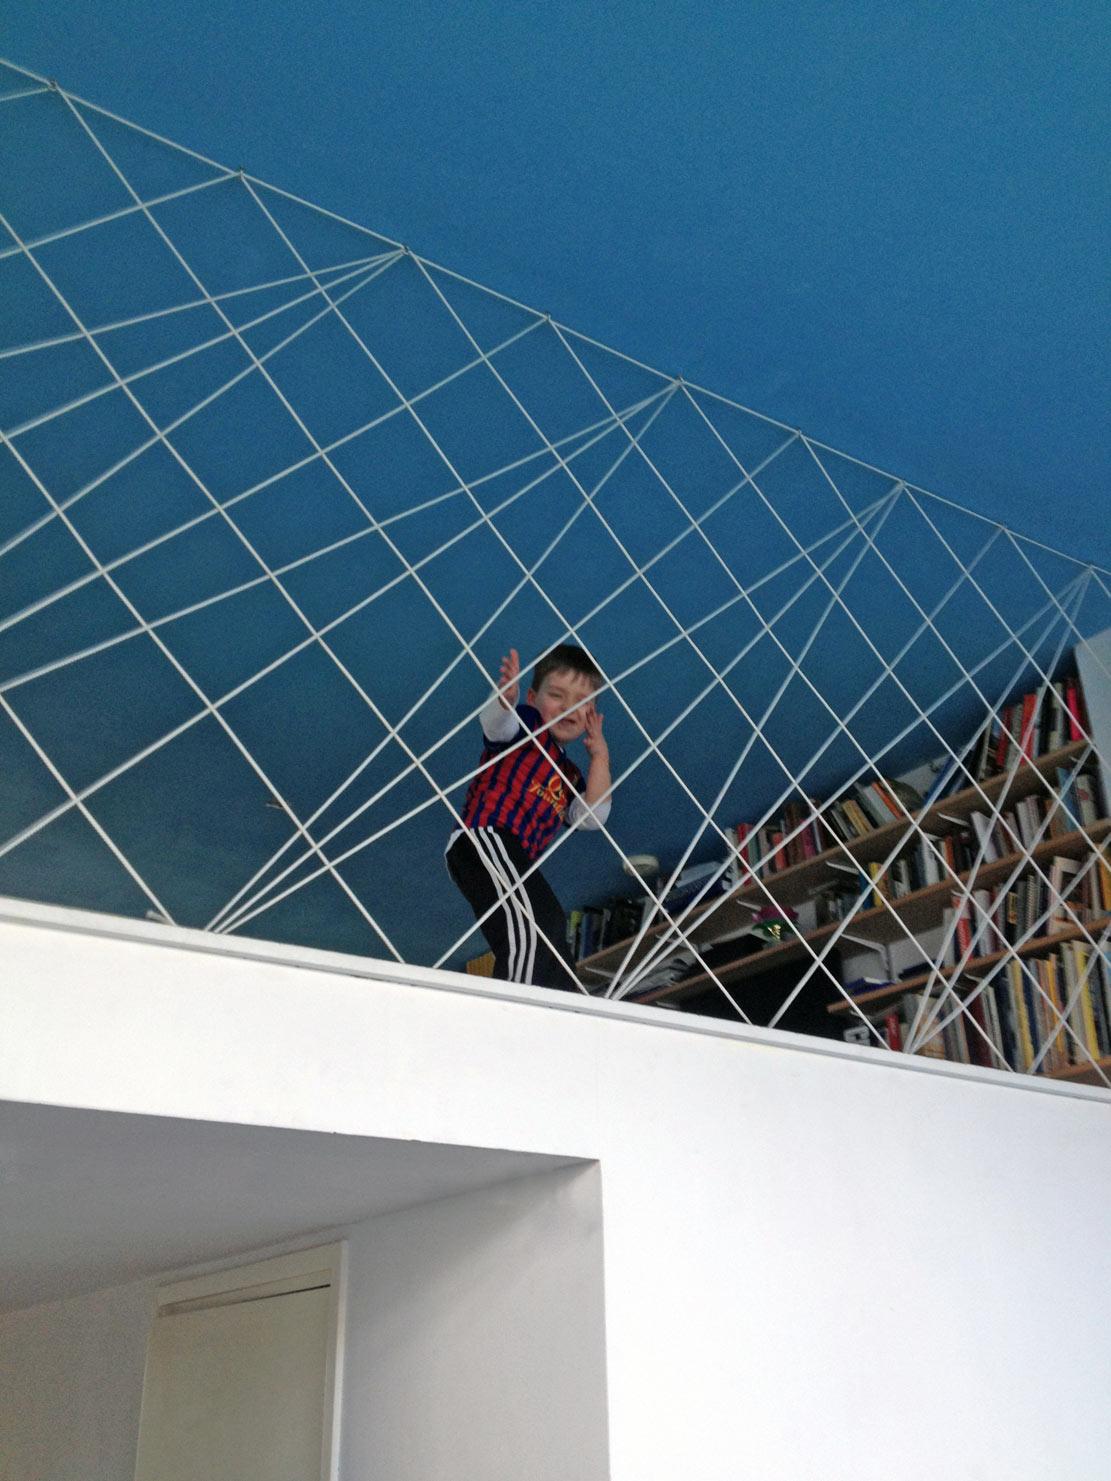 safety net, custom design